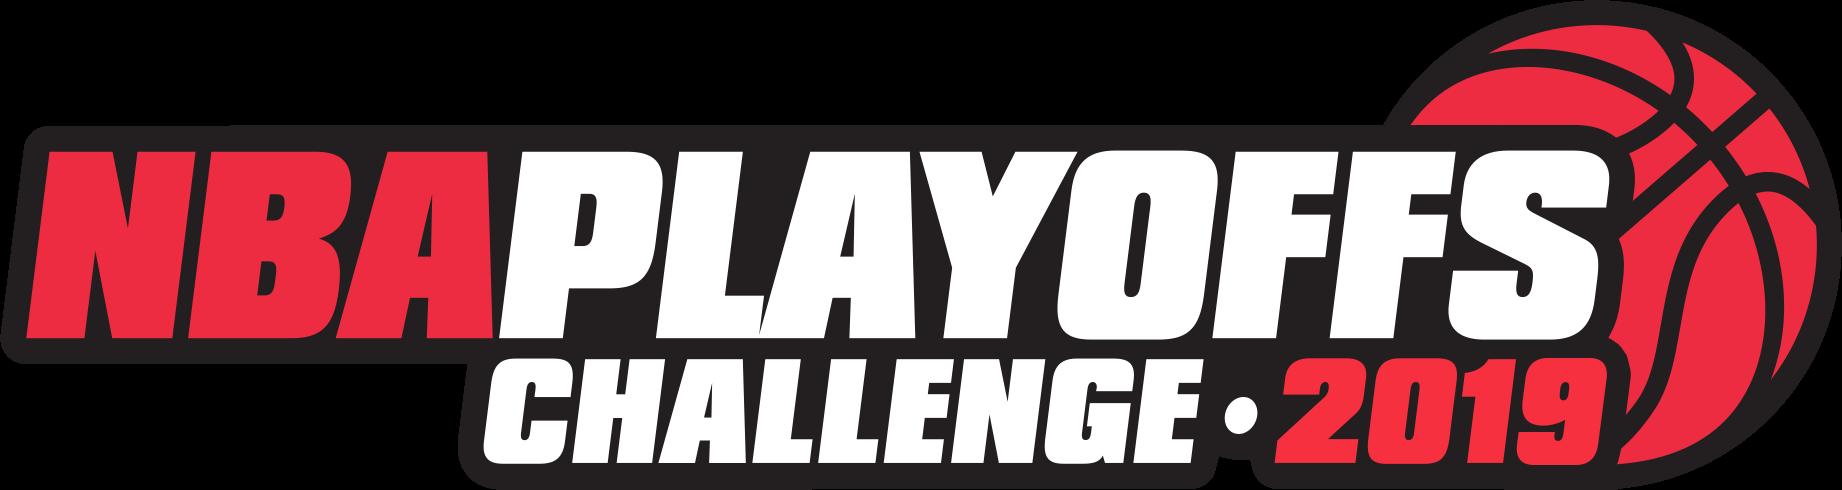 Download The Espnfootytips Nba Playoffs Challenge Clipart ...